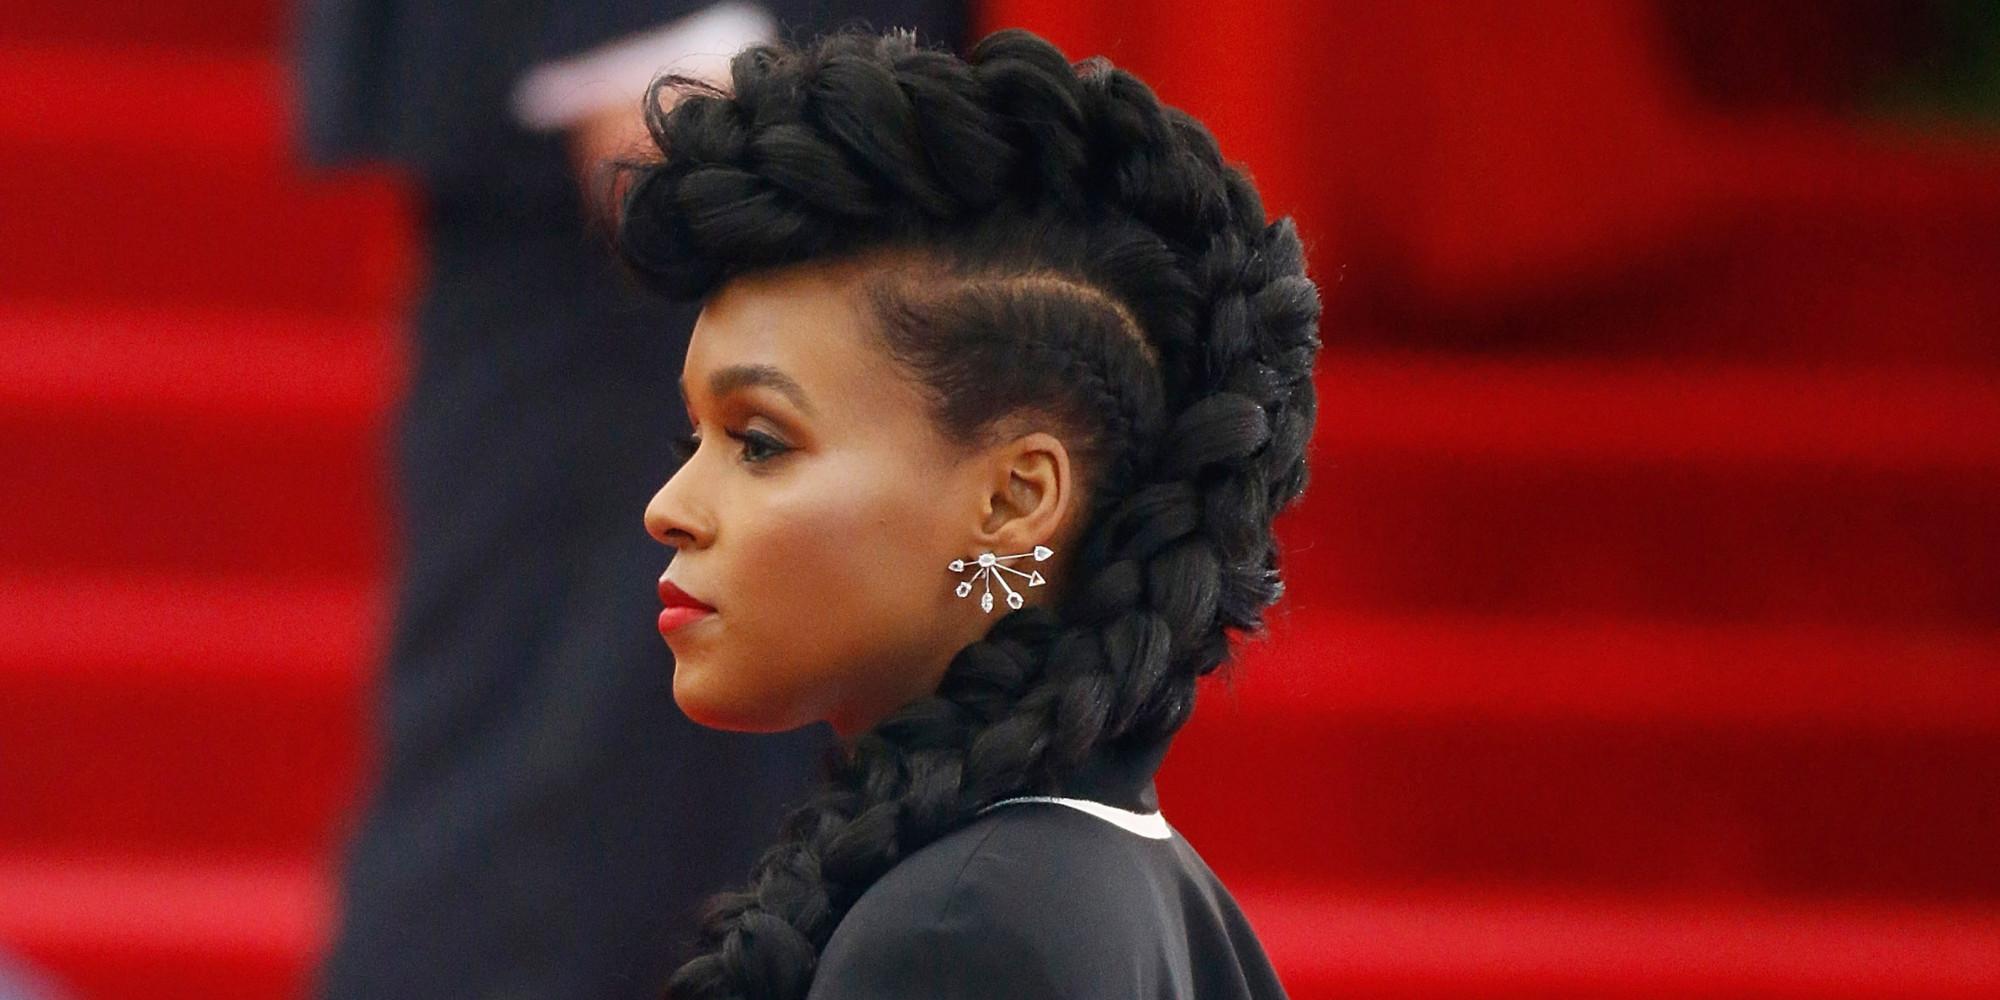 Groovy 40 Mohawk Hairstyles For Black Women Hairstyles For Women Draintrainus